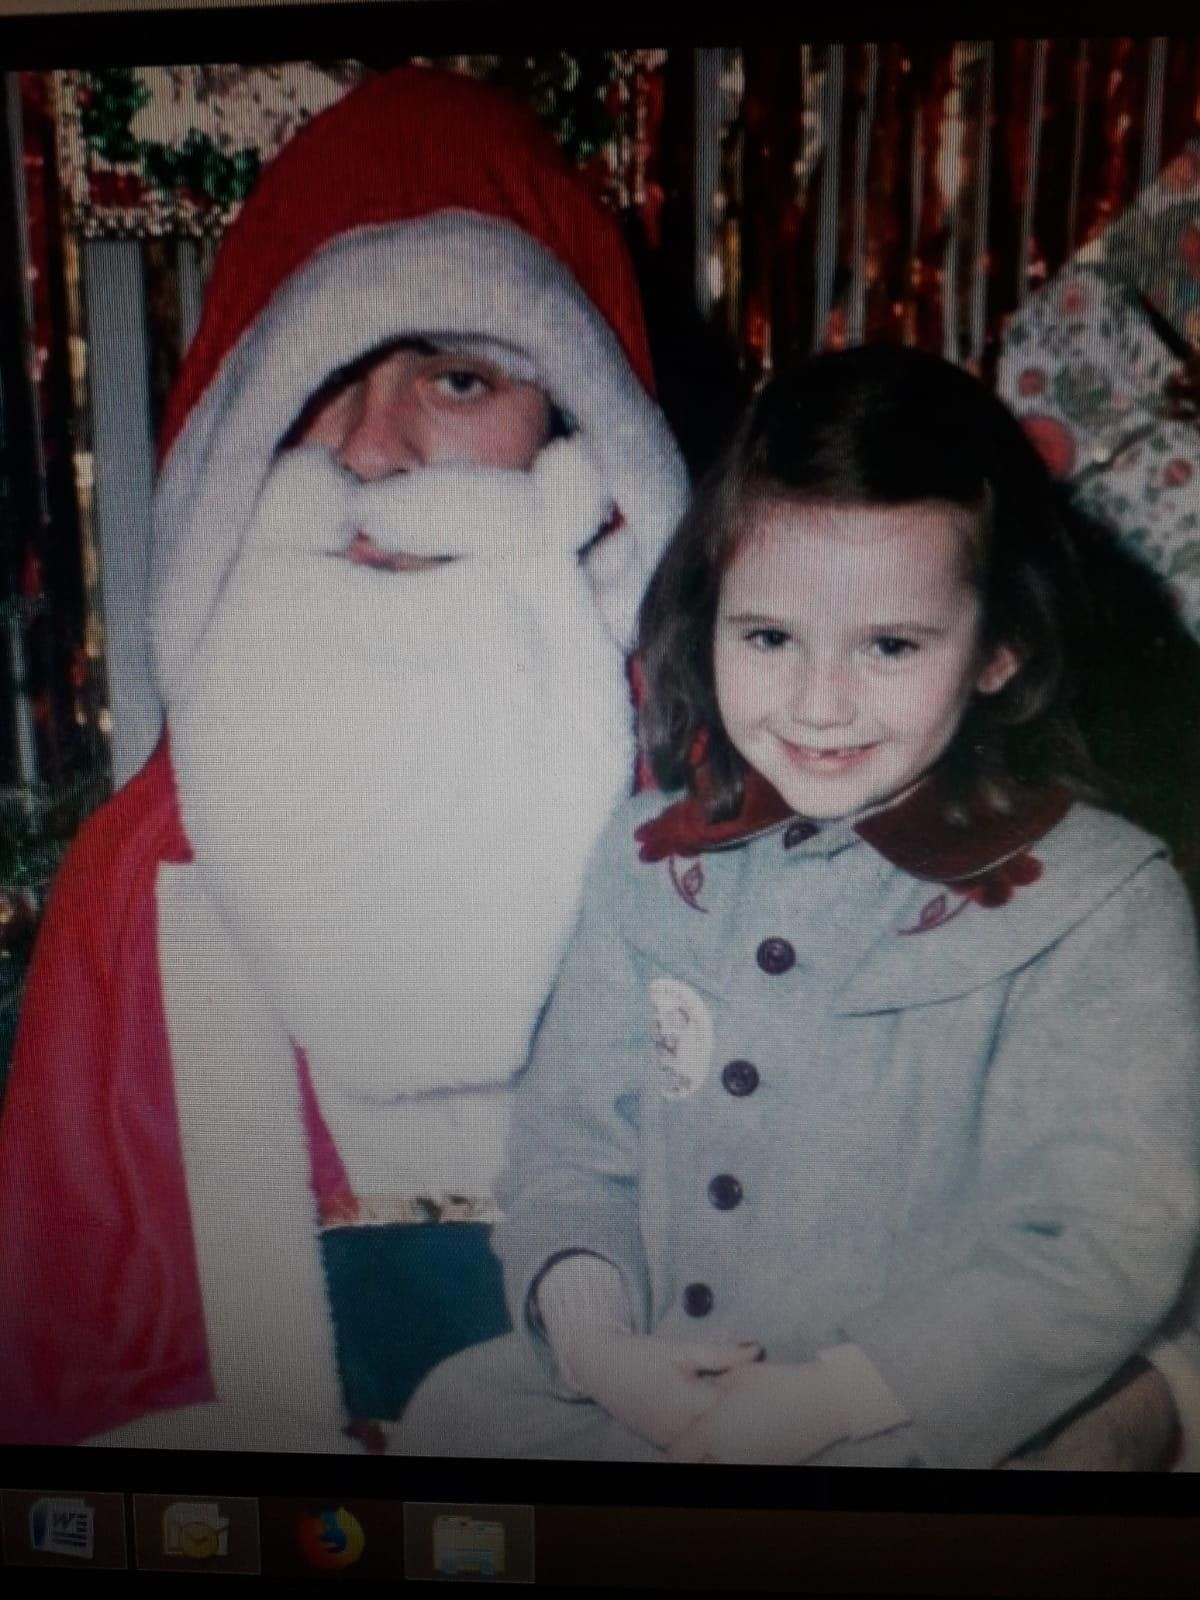 Retro Santa at the Makers Market Waterford